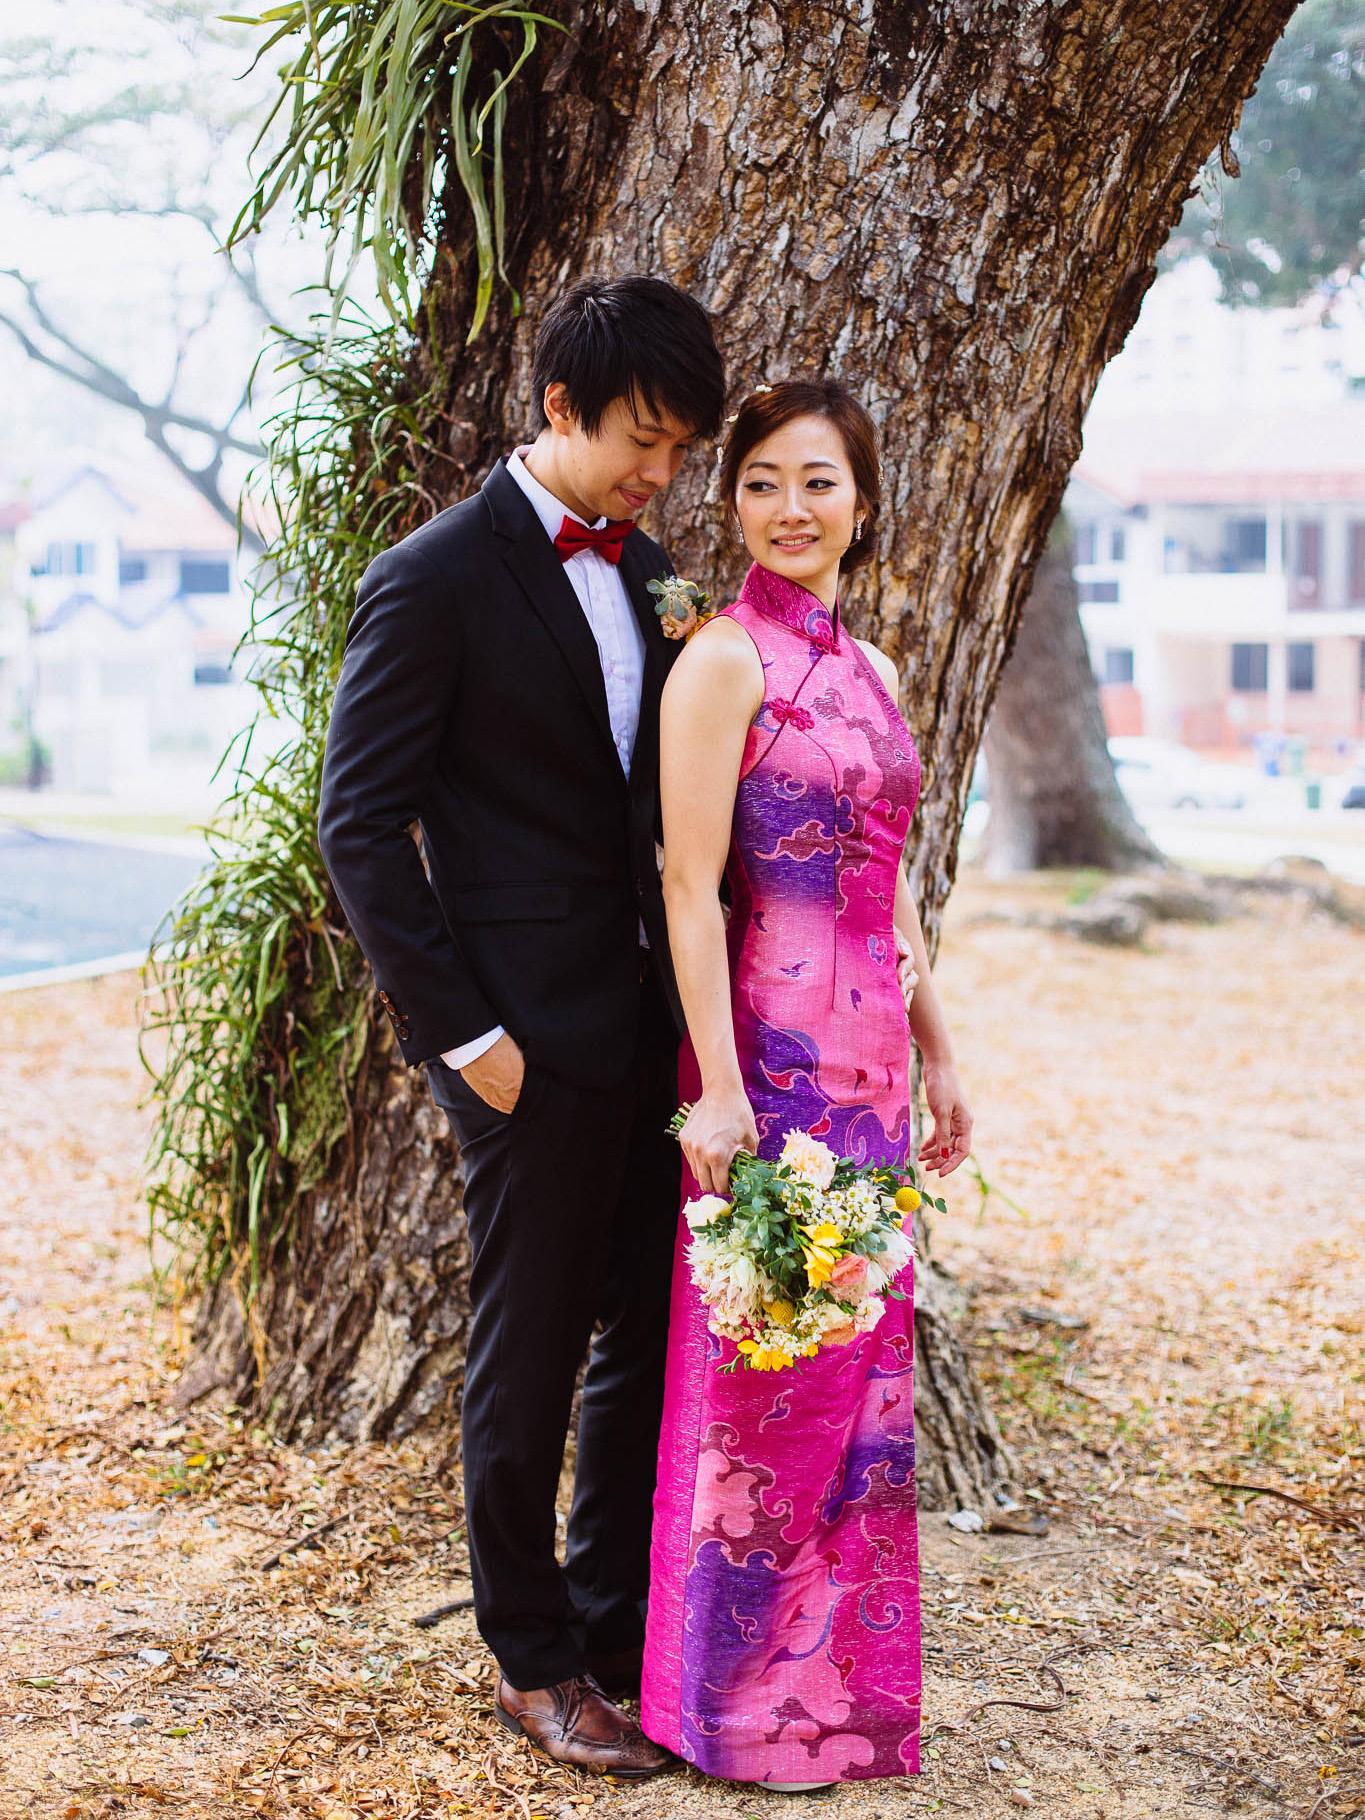 singapore-wedding-photographer-malay-indian-pre-wedding-travel-wmt-2015-48.jpg